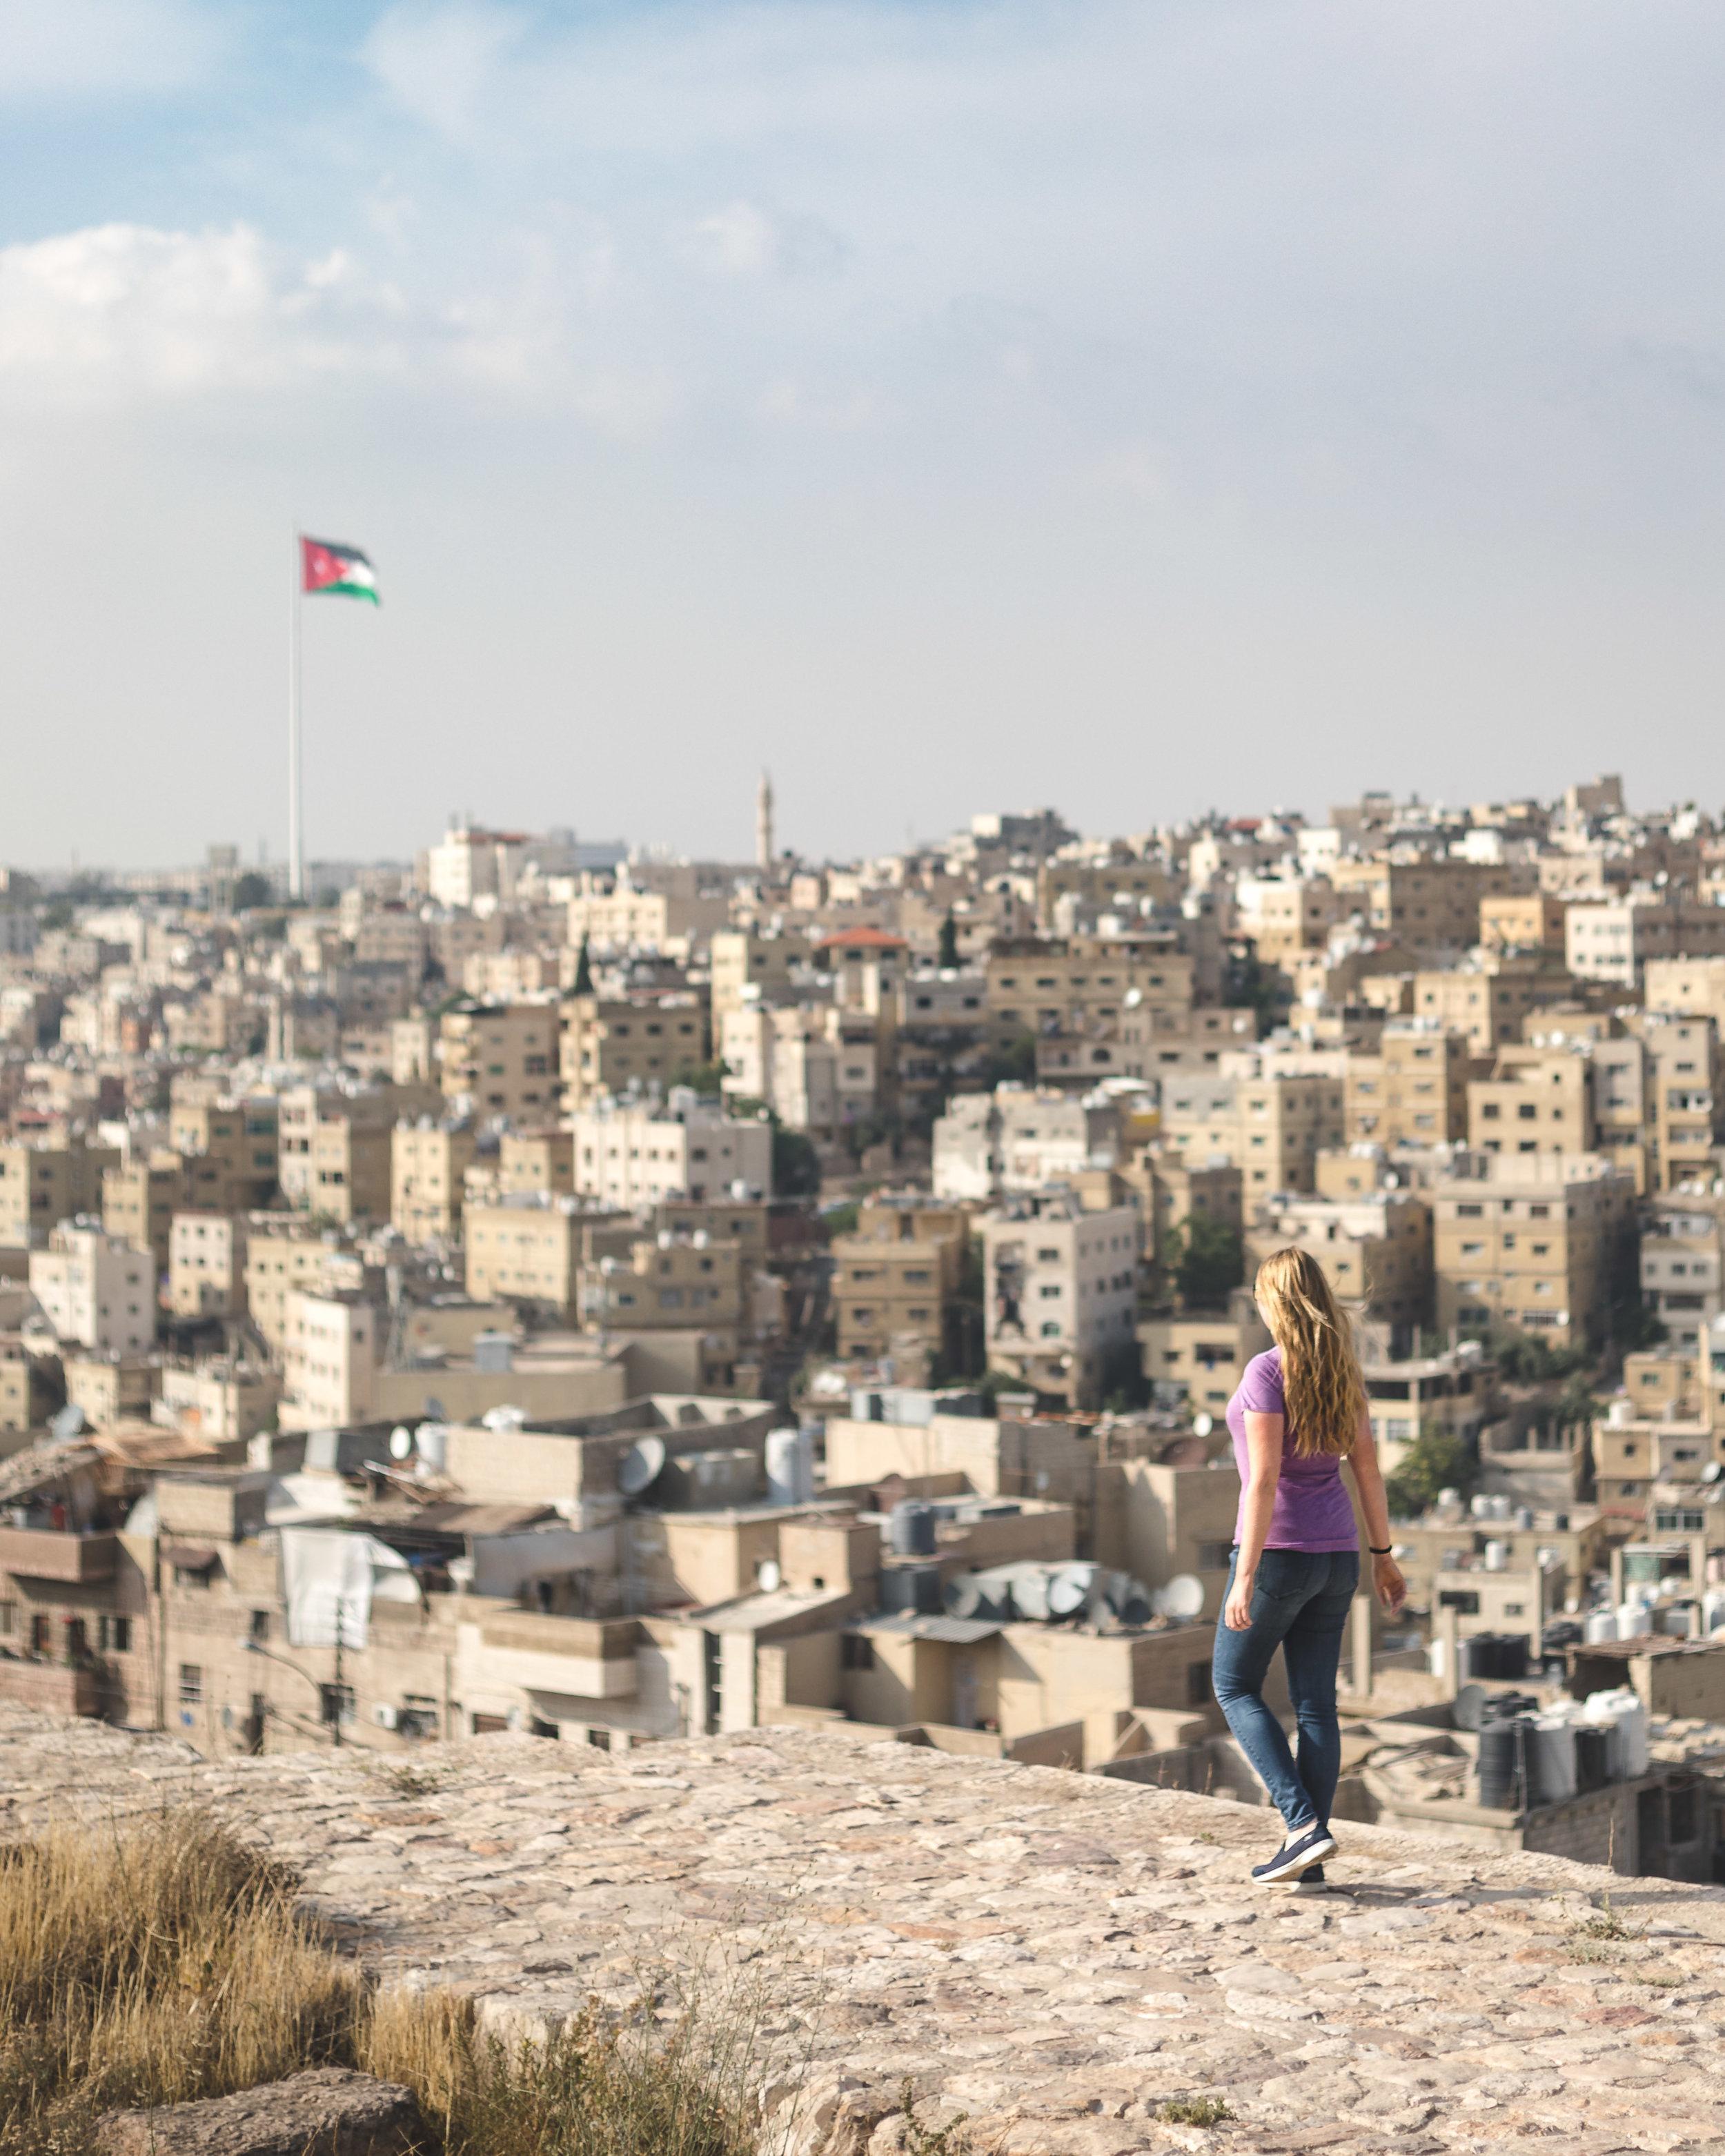 Views from the Citadel Amman